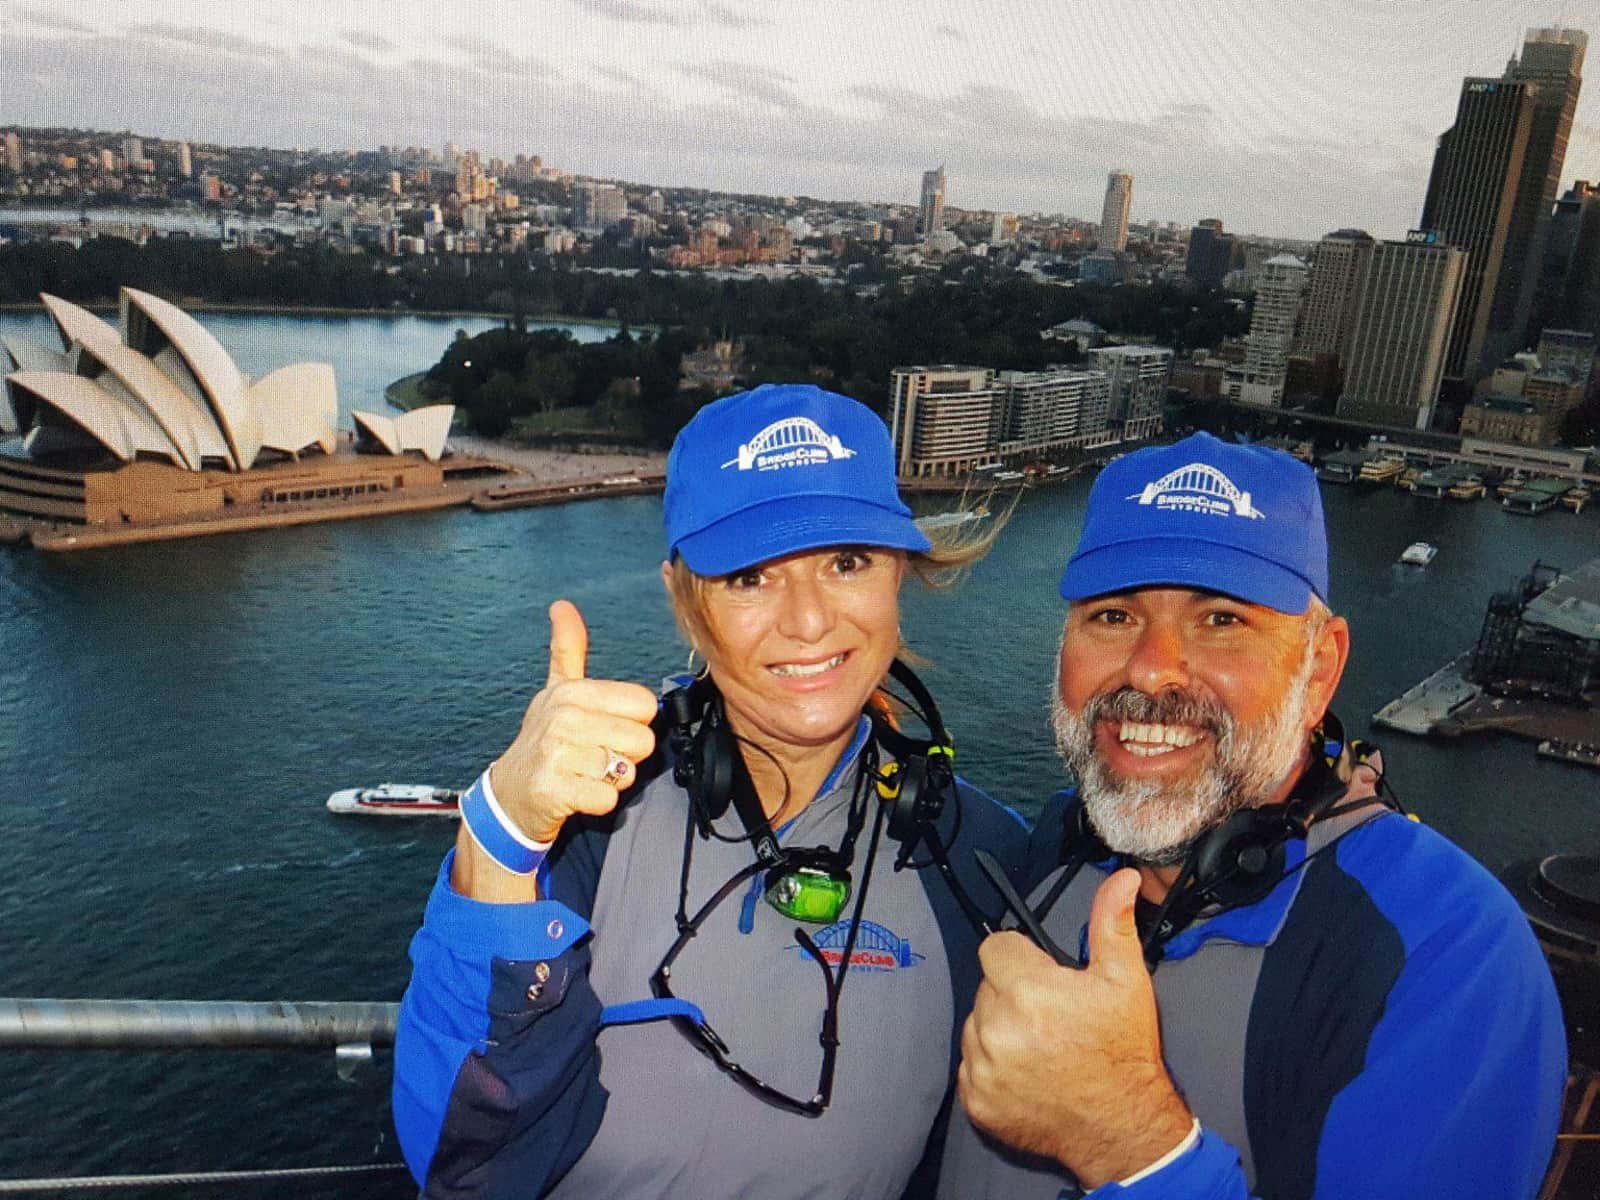 Helen & Robert from Townsville, Queensland, Australia